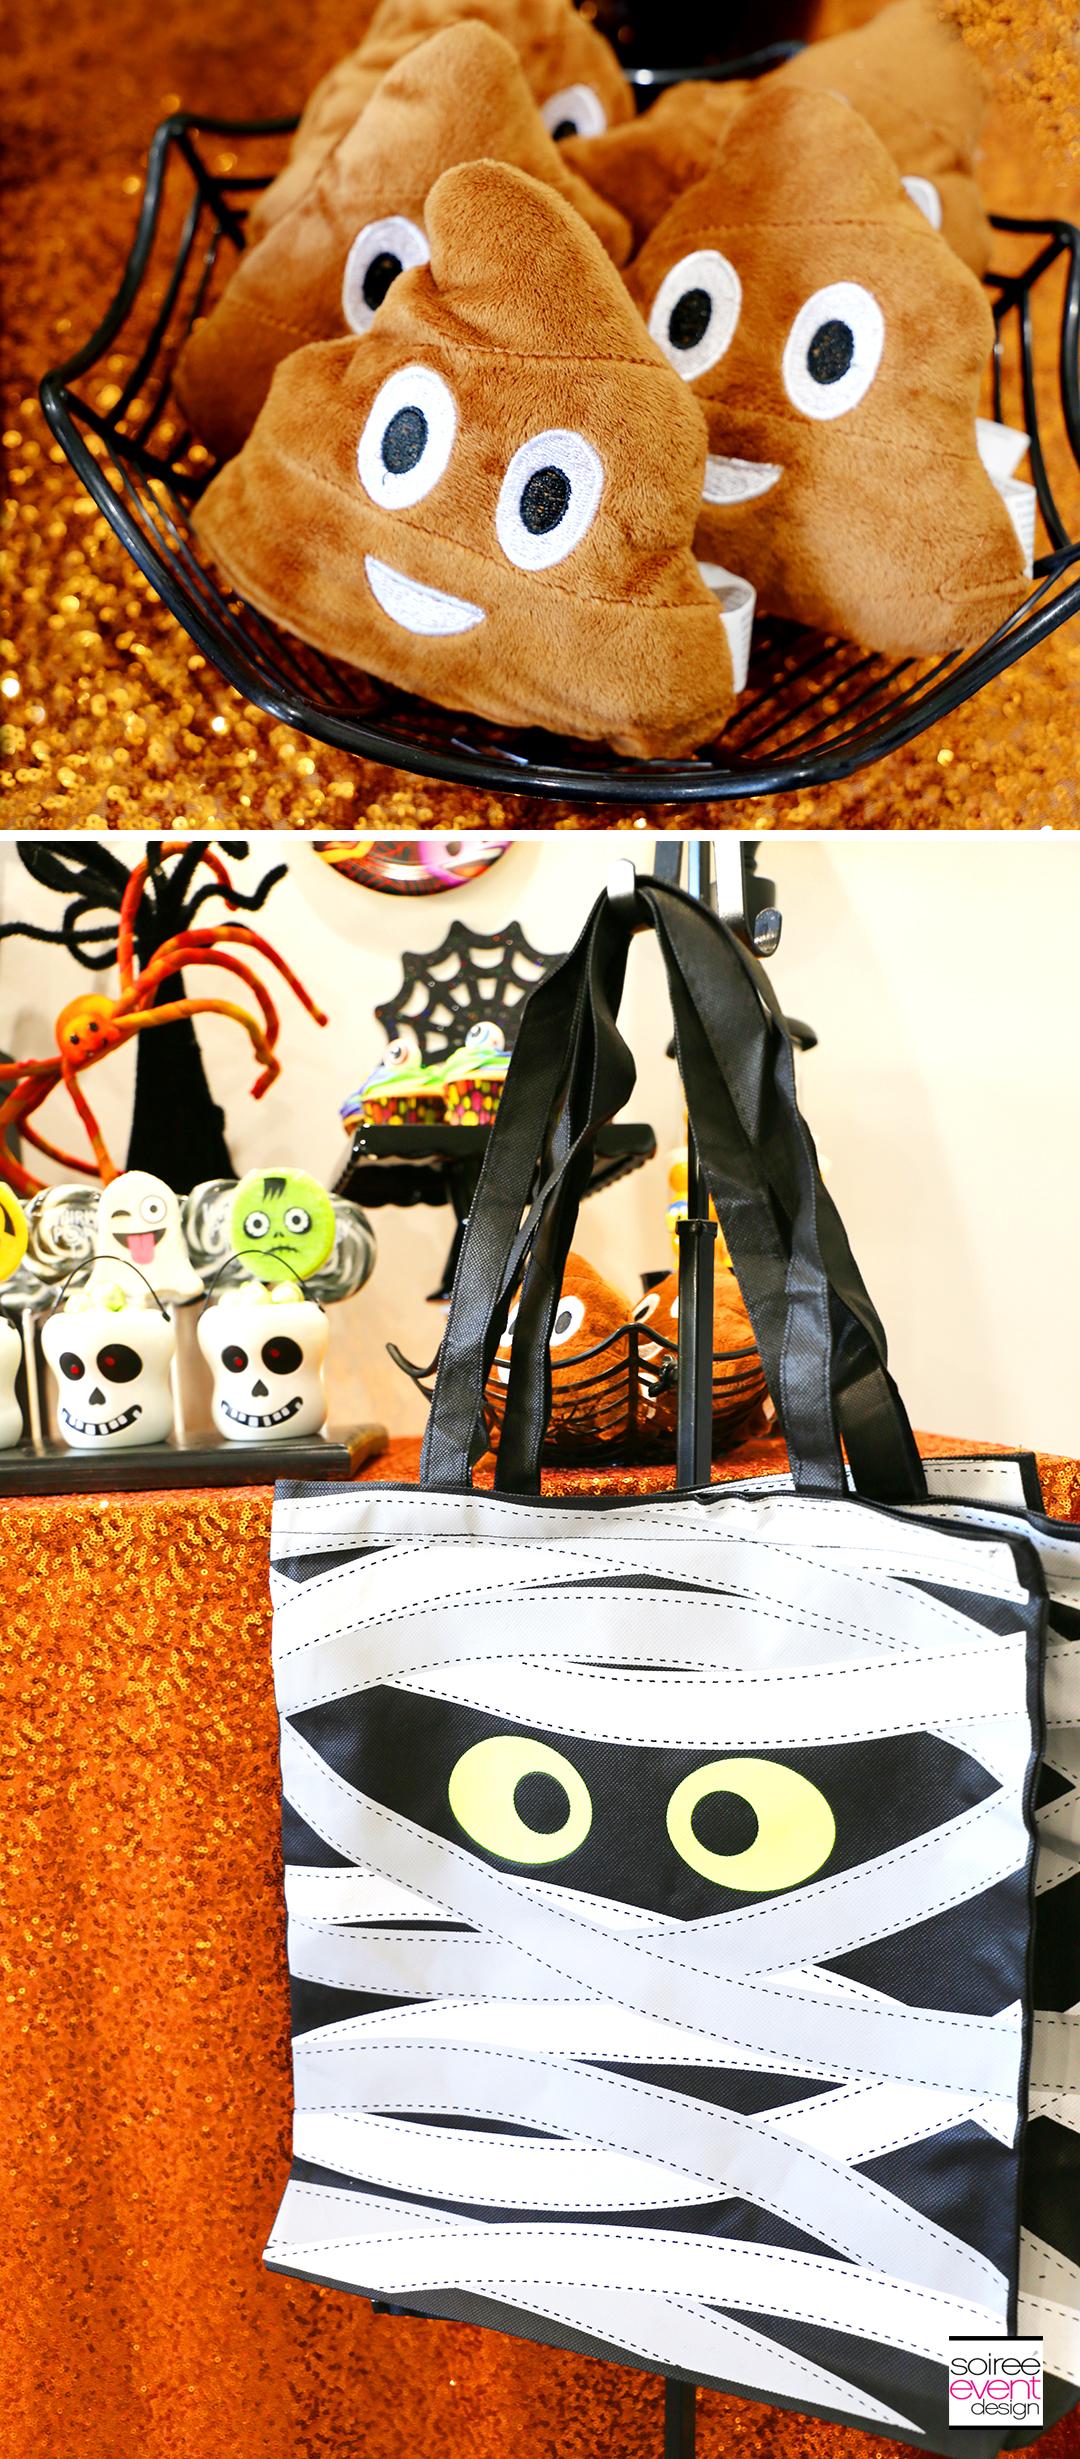 Emoji Halloween Party Ideas - Plush Poop Emojis